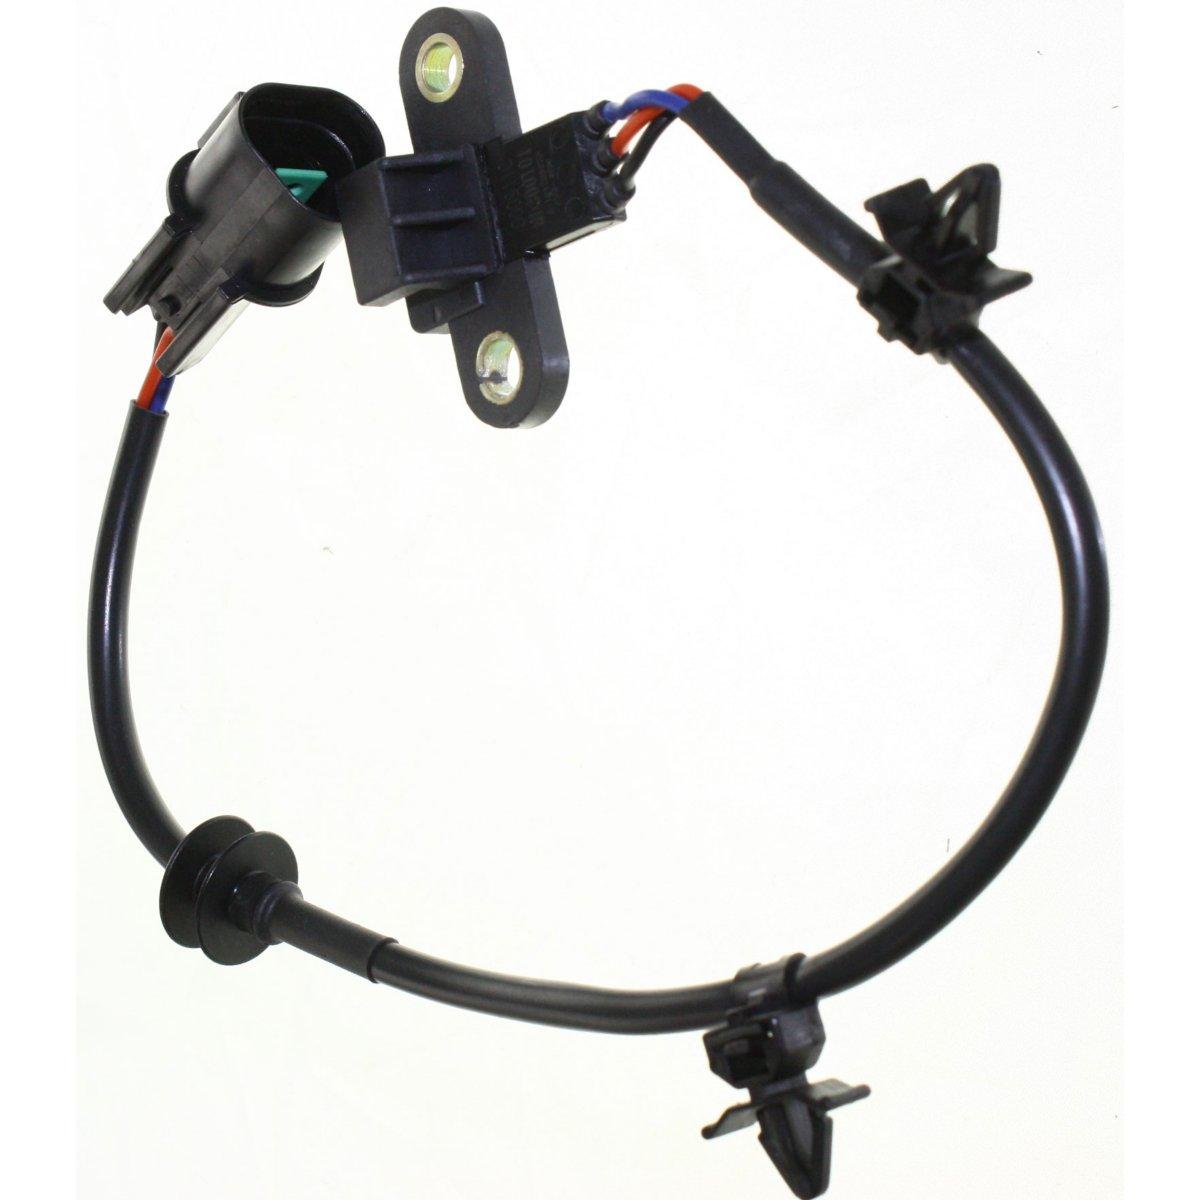 1999 Mitsubishi Galant Camshaft: New Crankshaft Position Sensor Mitsubishi Eclipse Galant